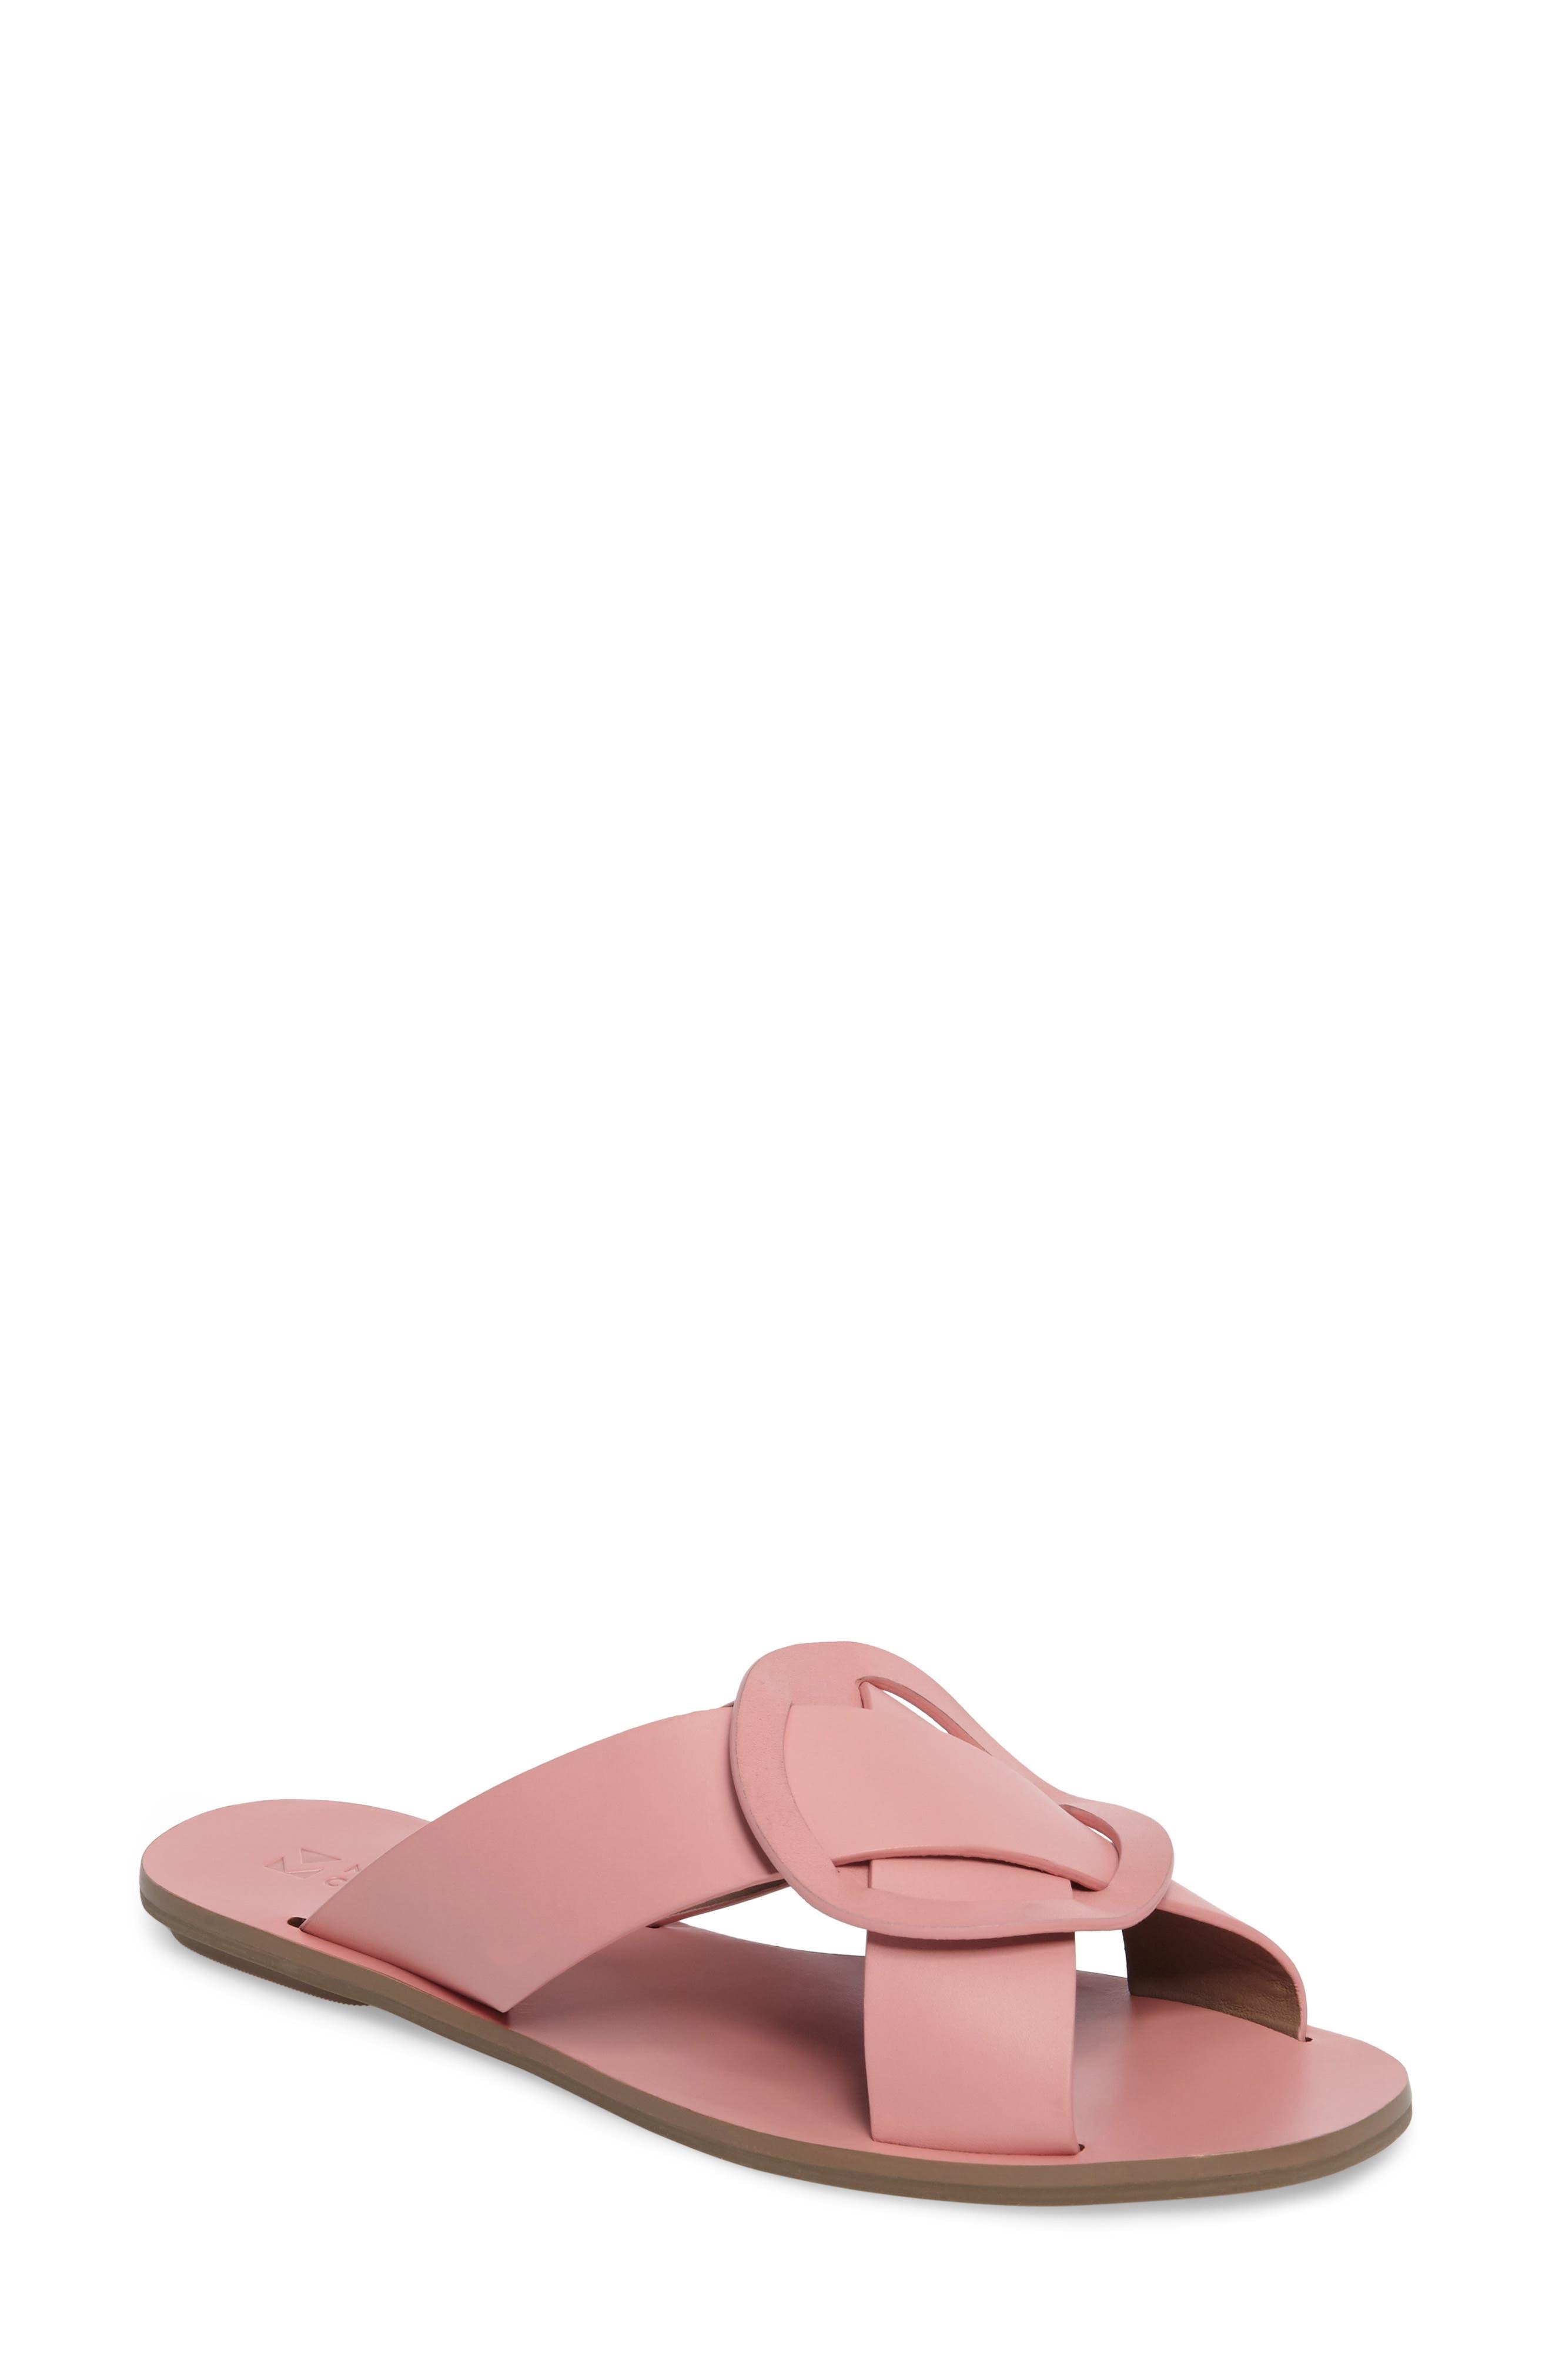 Carlein Slide Sandal,                         Main,                         color, Pink Peony Leather